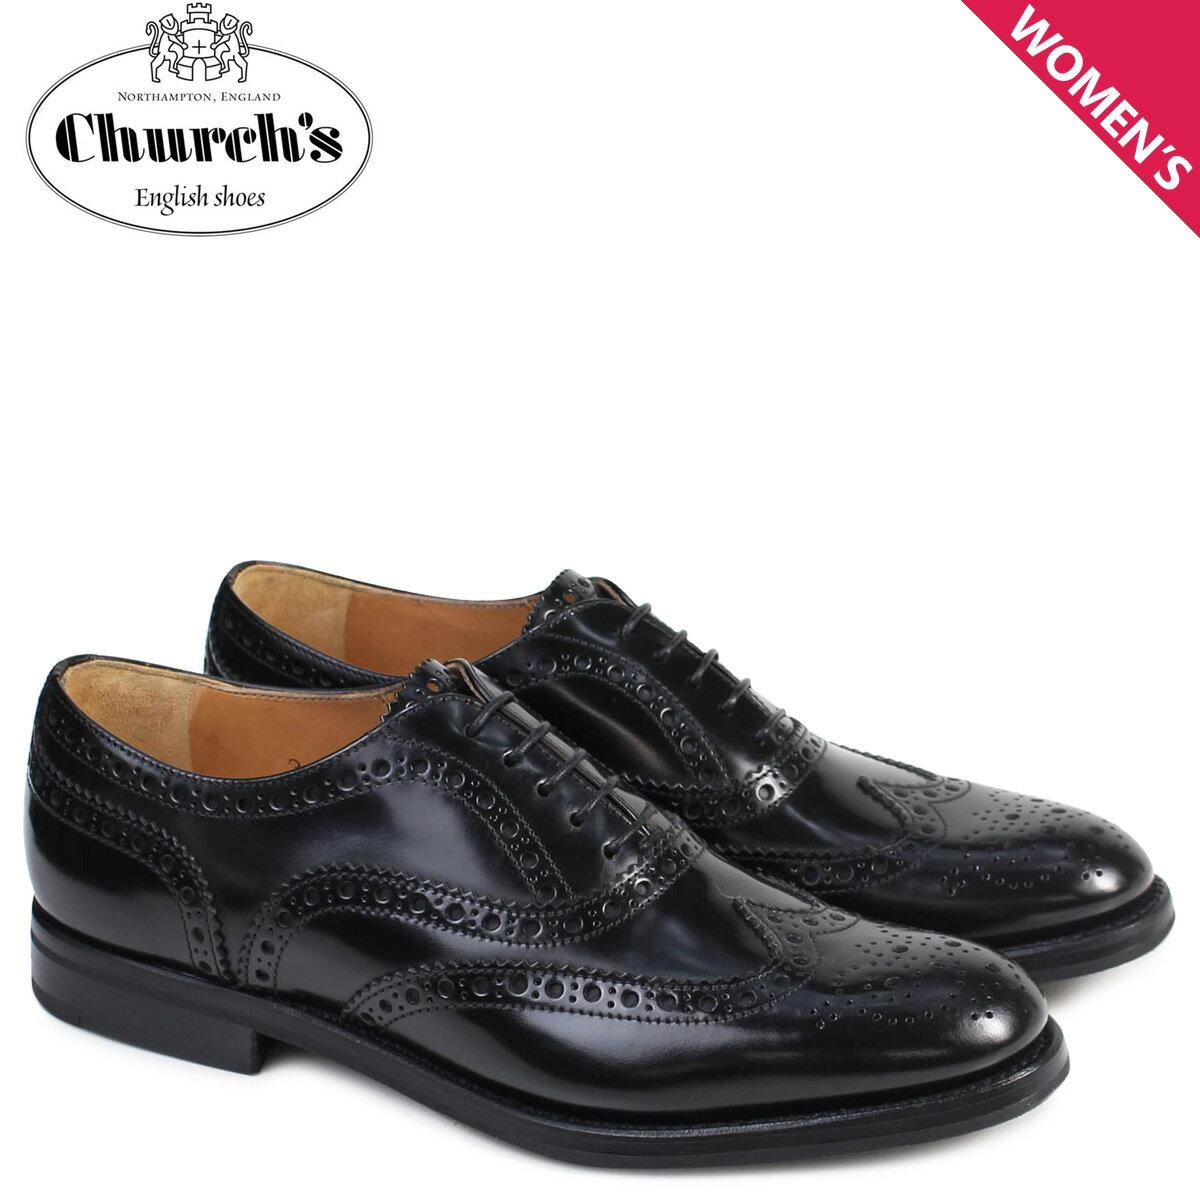 Churchs Burwood WG Polish Binder Calf 靴 レディース チャーチ バーウッド シューズ ウイングチップ 8705 DE0001 ブラック [12/21 再入荷] [1712]